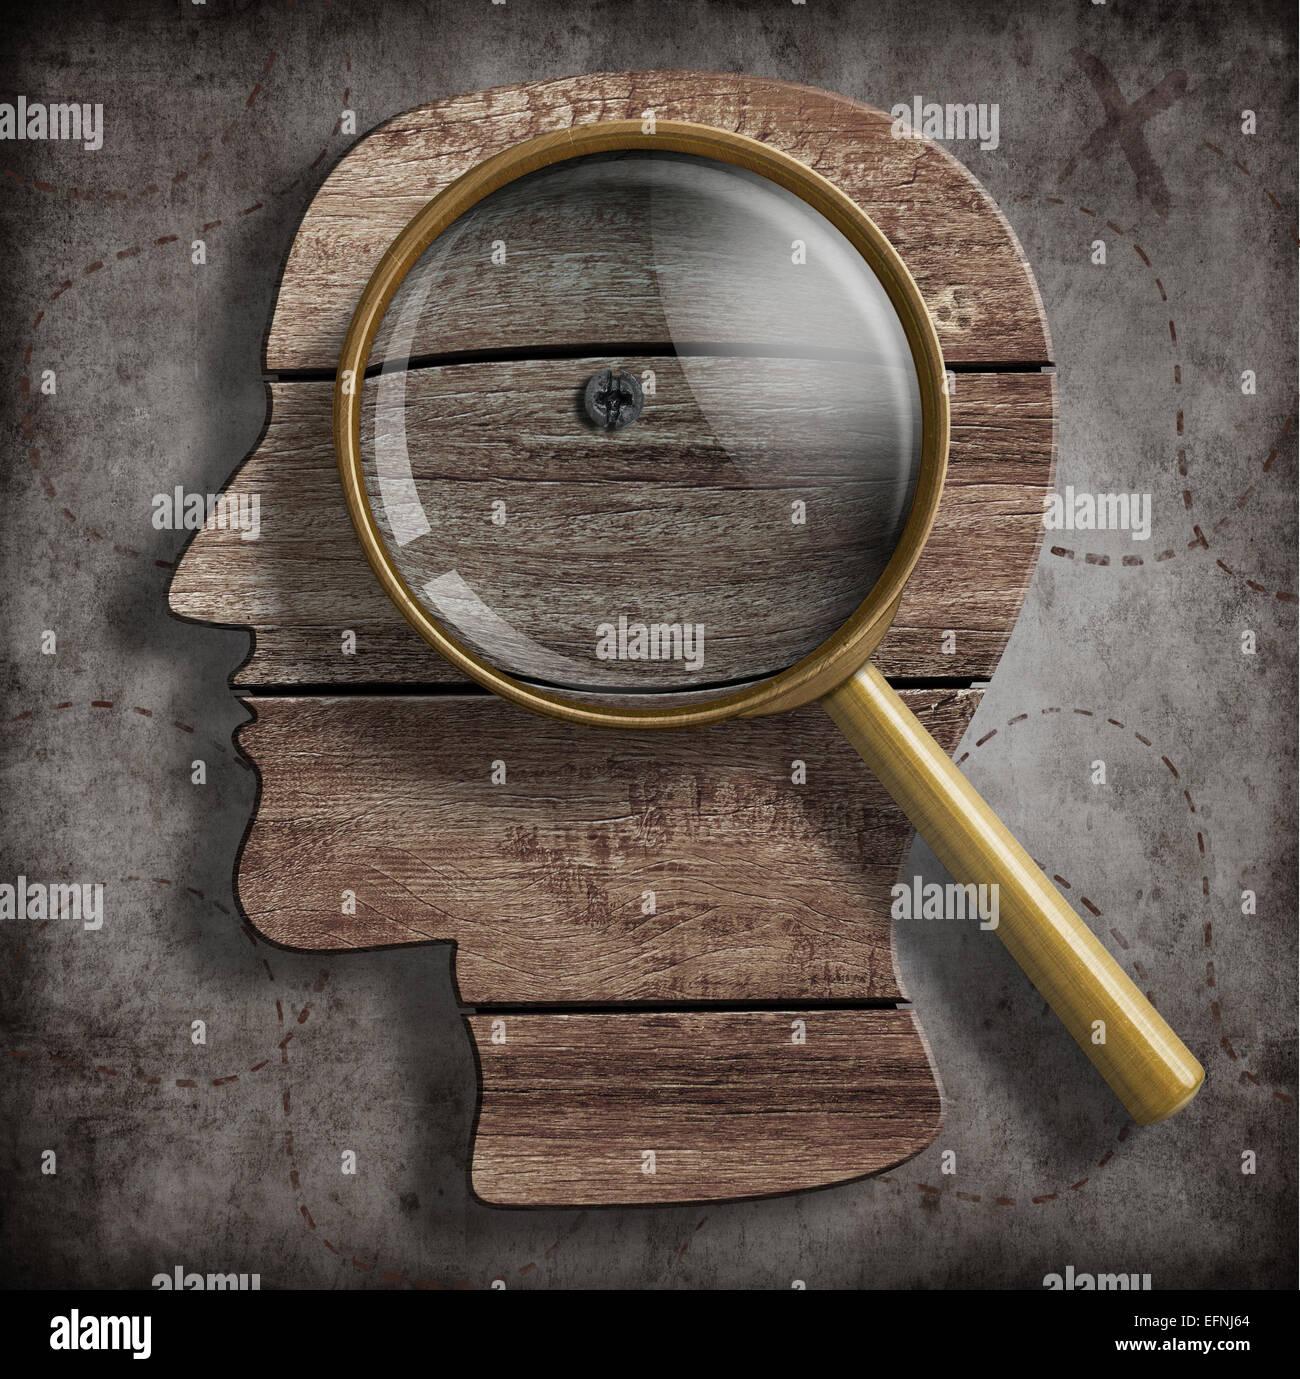 Cerebro o psicología problema research concept Imagen De Stock